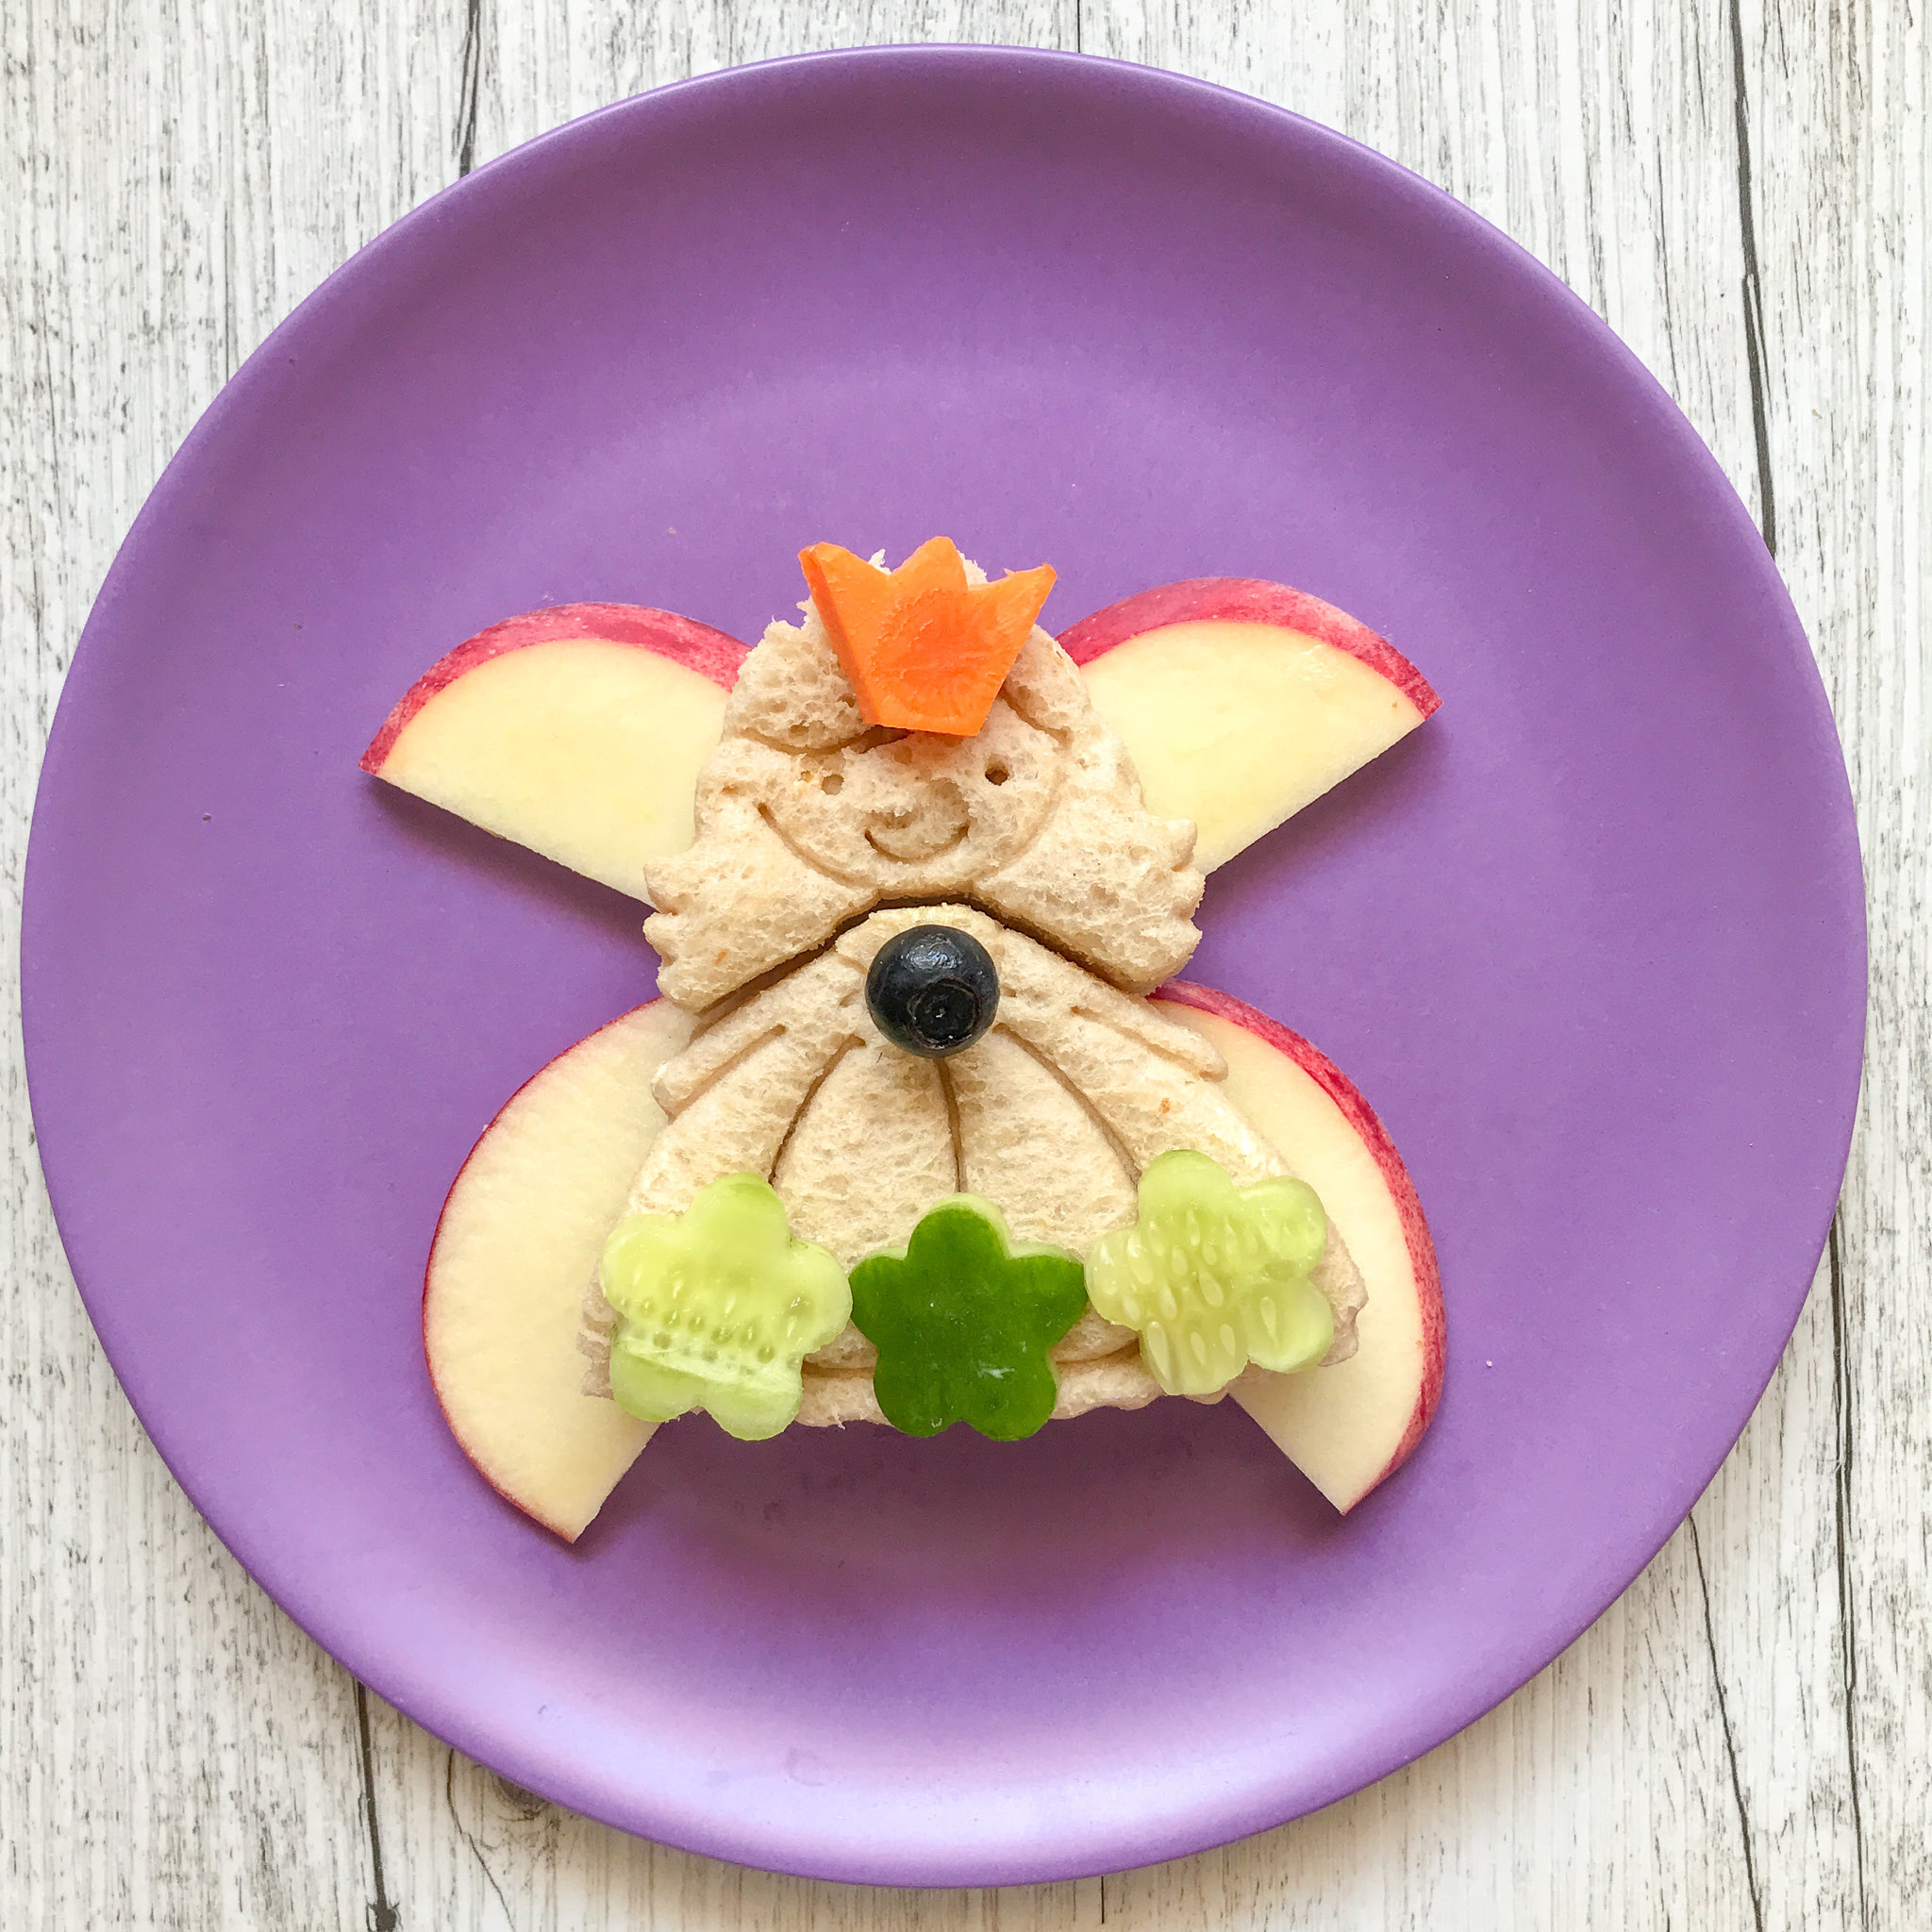 Lunch Punch Sandwich Cutters - Princess-5